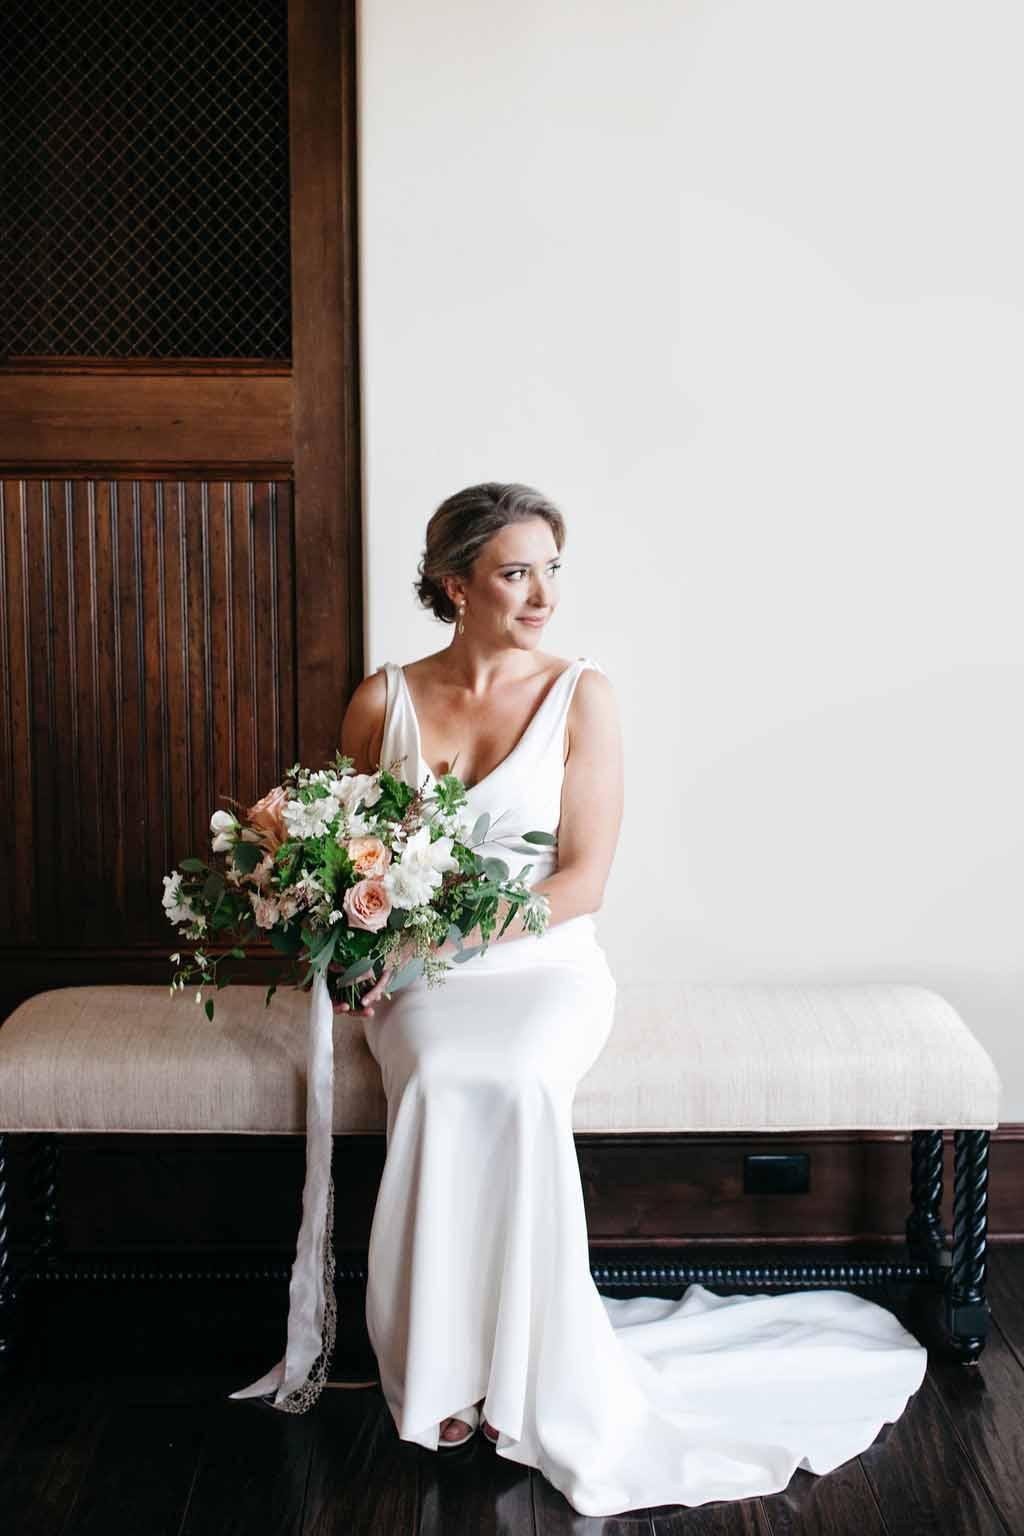 Bride holding her bouquet of garden fall flowers - Elegant Seattle Garden Wedding by Flora Nova Design Seattle